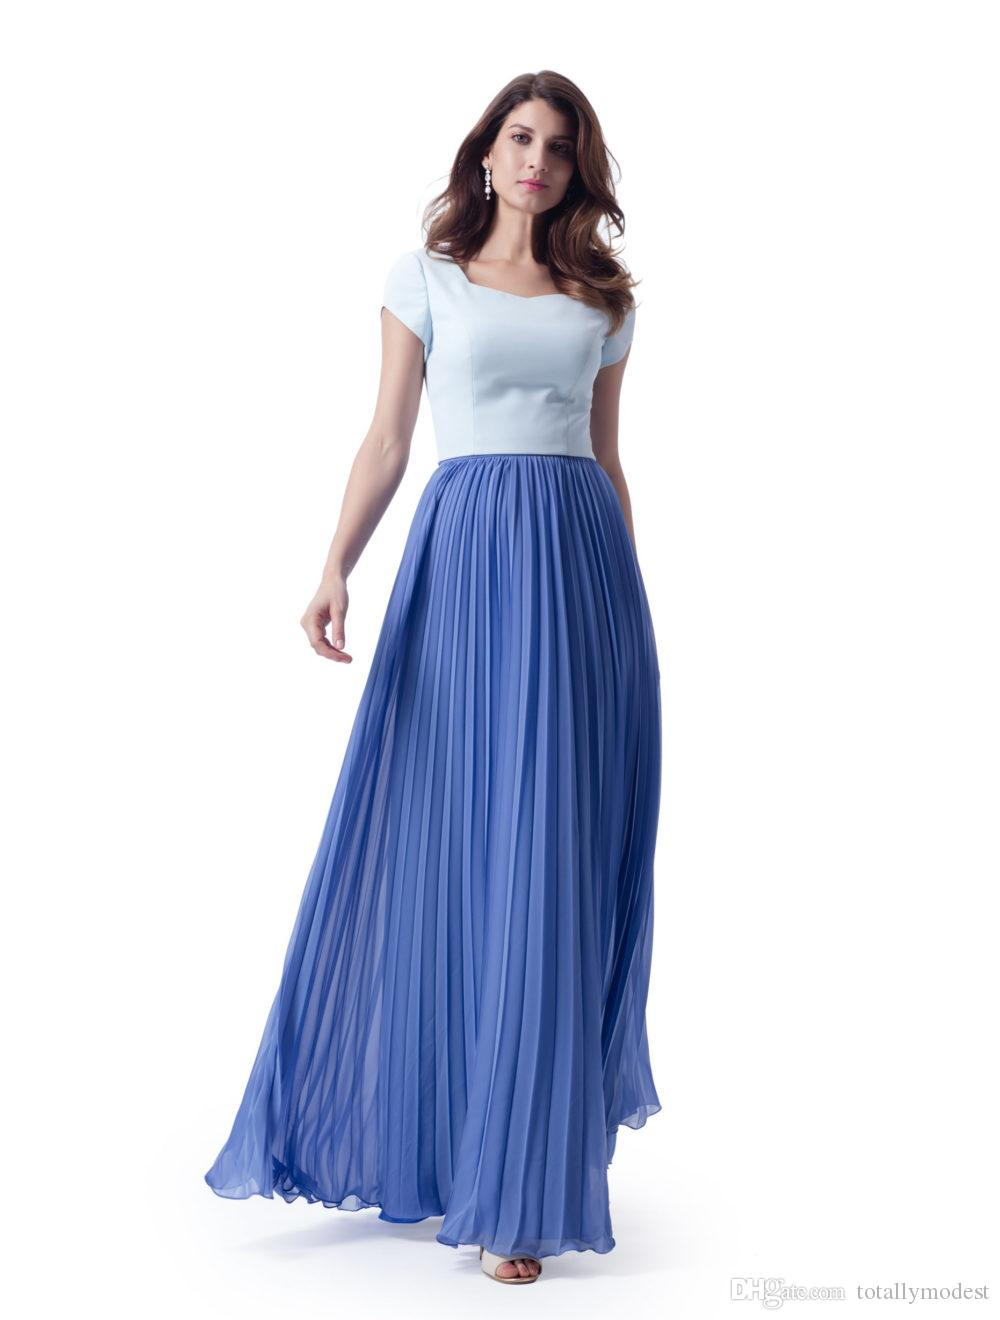 Two Toned Blue Long Modest Bridesmaid Dresses Sleeved Cap Sleeve Pleats Chiffon A-line Simple Fashion Maids of Honor Dresses Custom Made